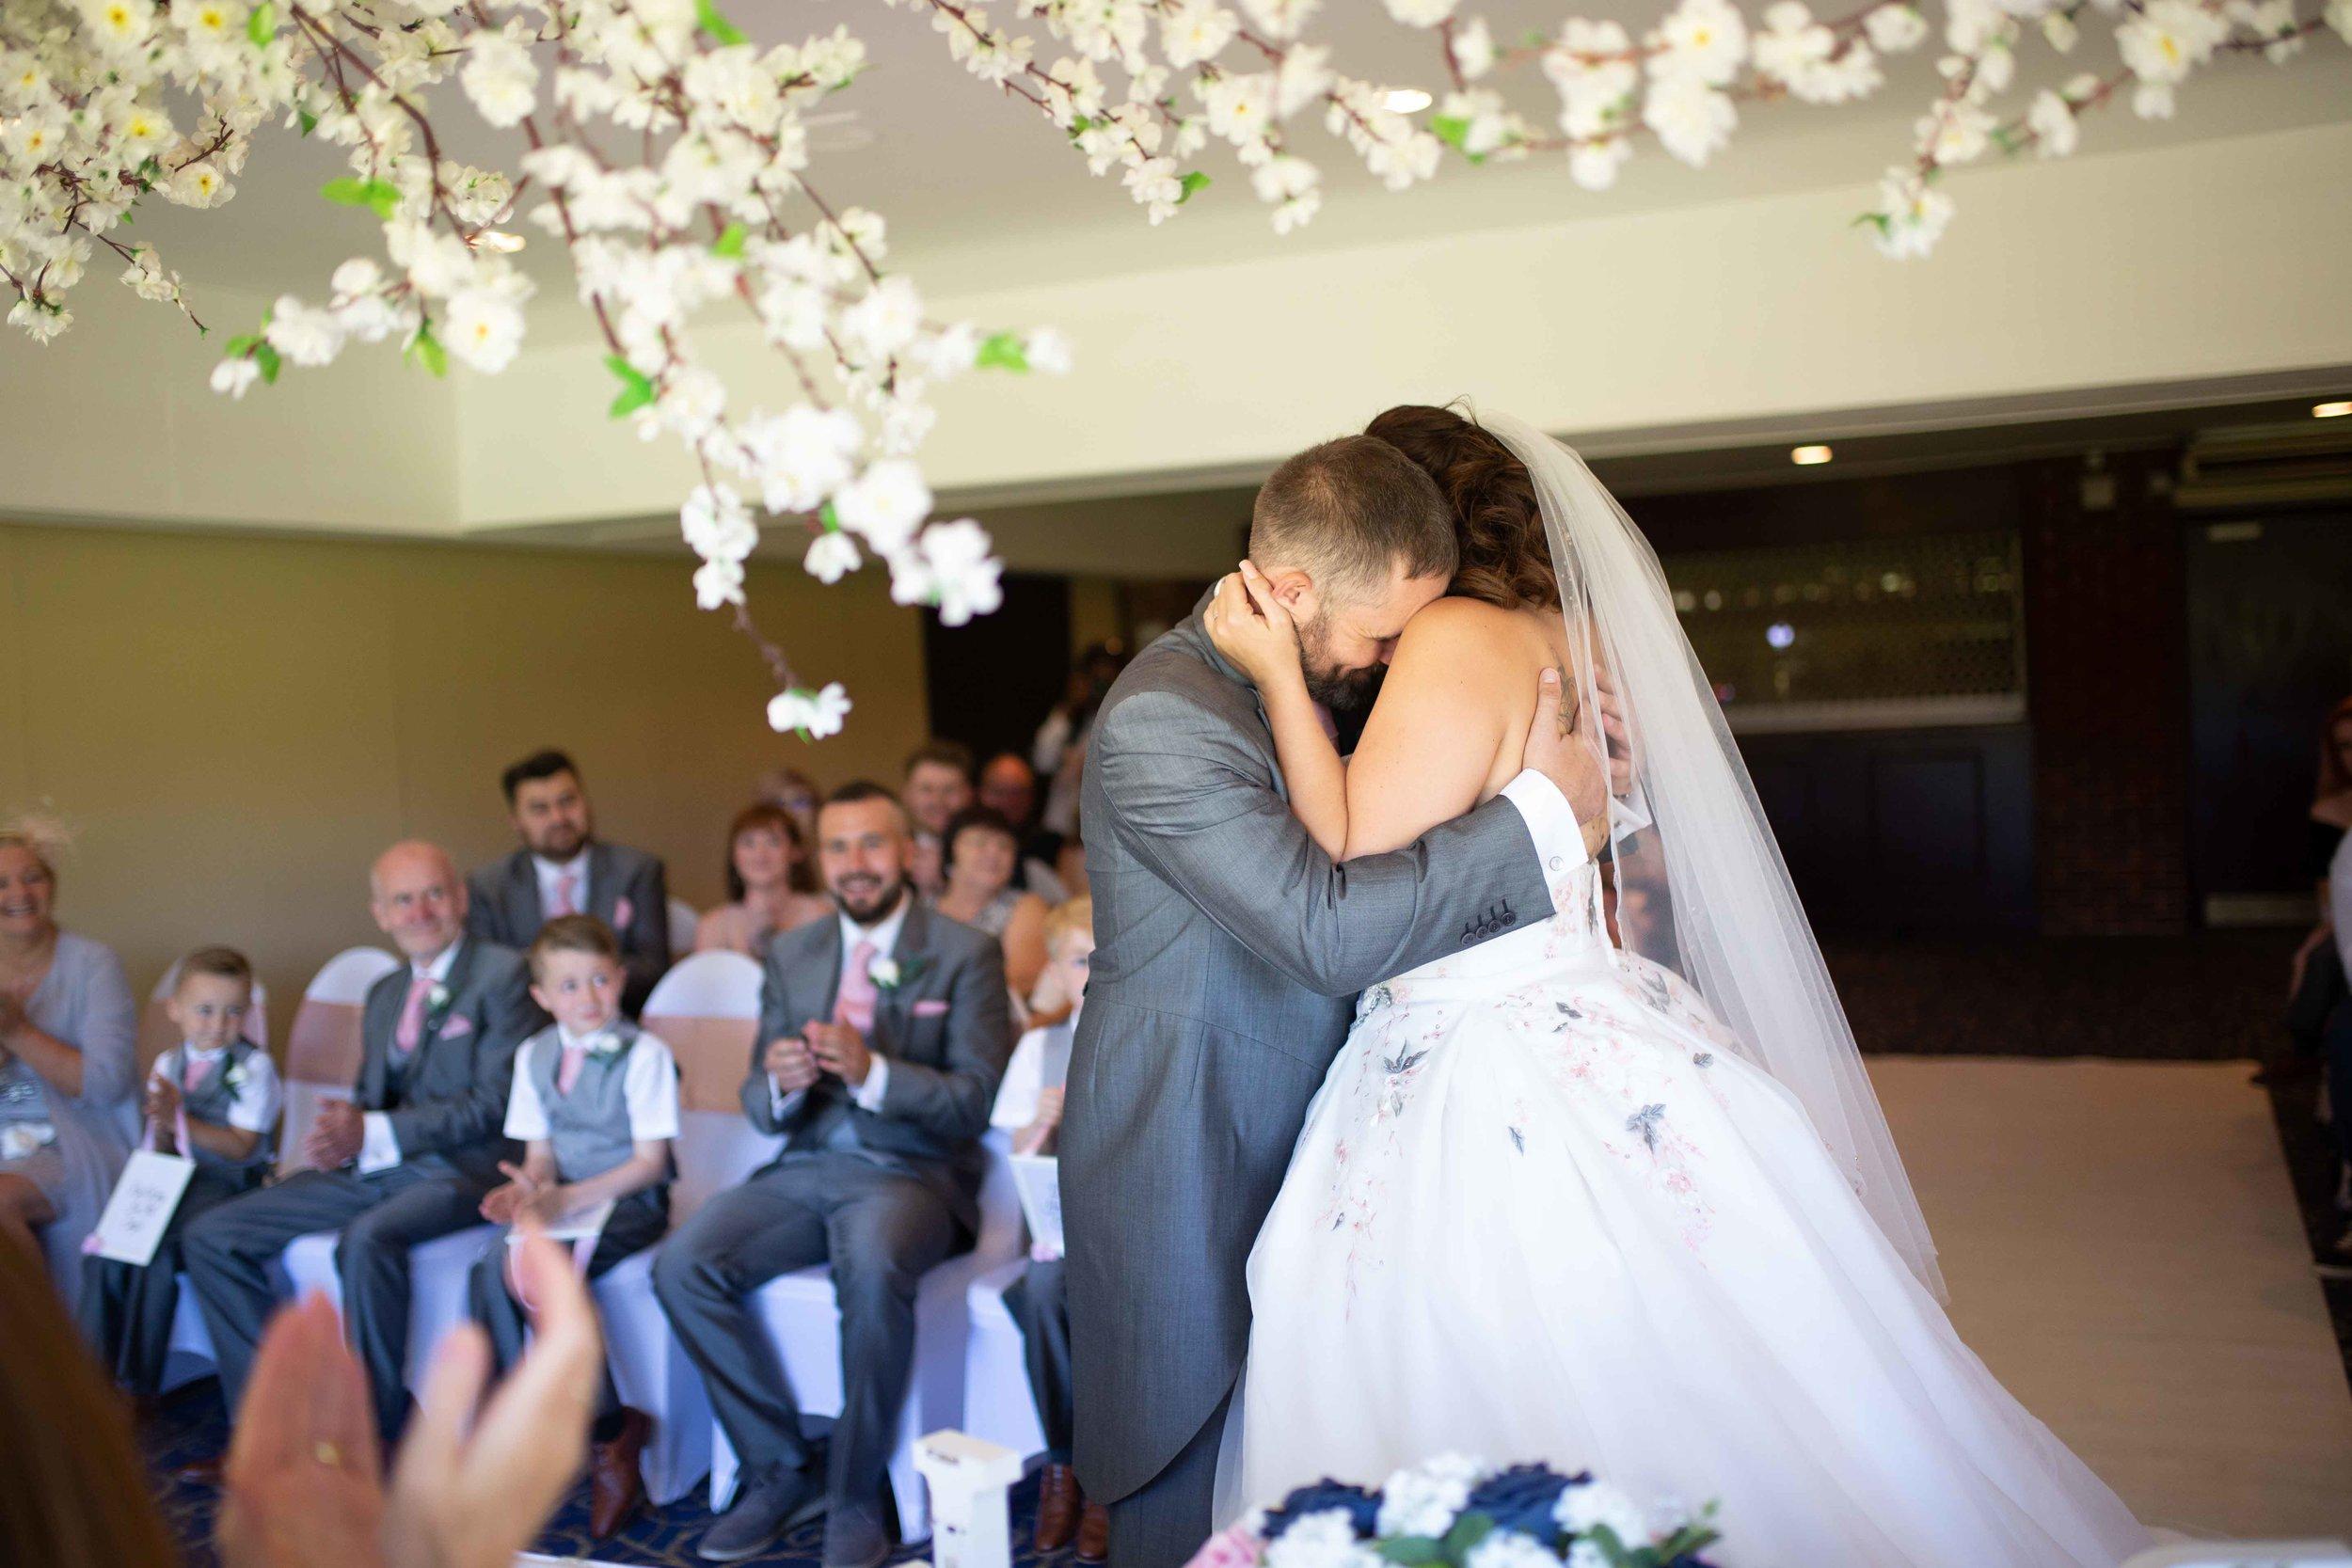 Lea-cooper-photography-wedding-photography-wolverhampton-patshull-park-hotel-wedding-pattingham-wolverhampton-west-midlands-uk-24.JPG